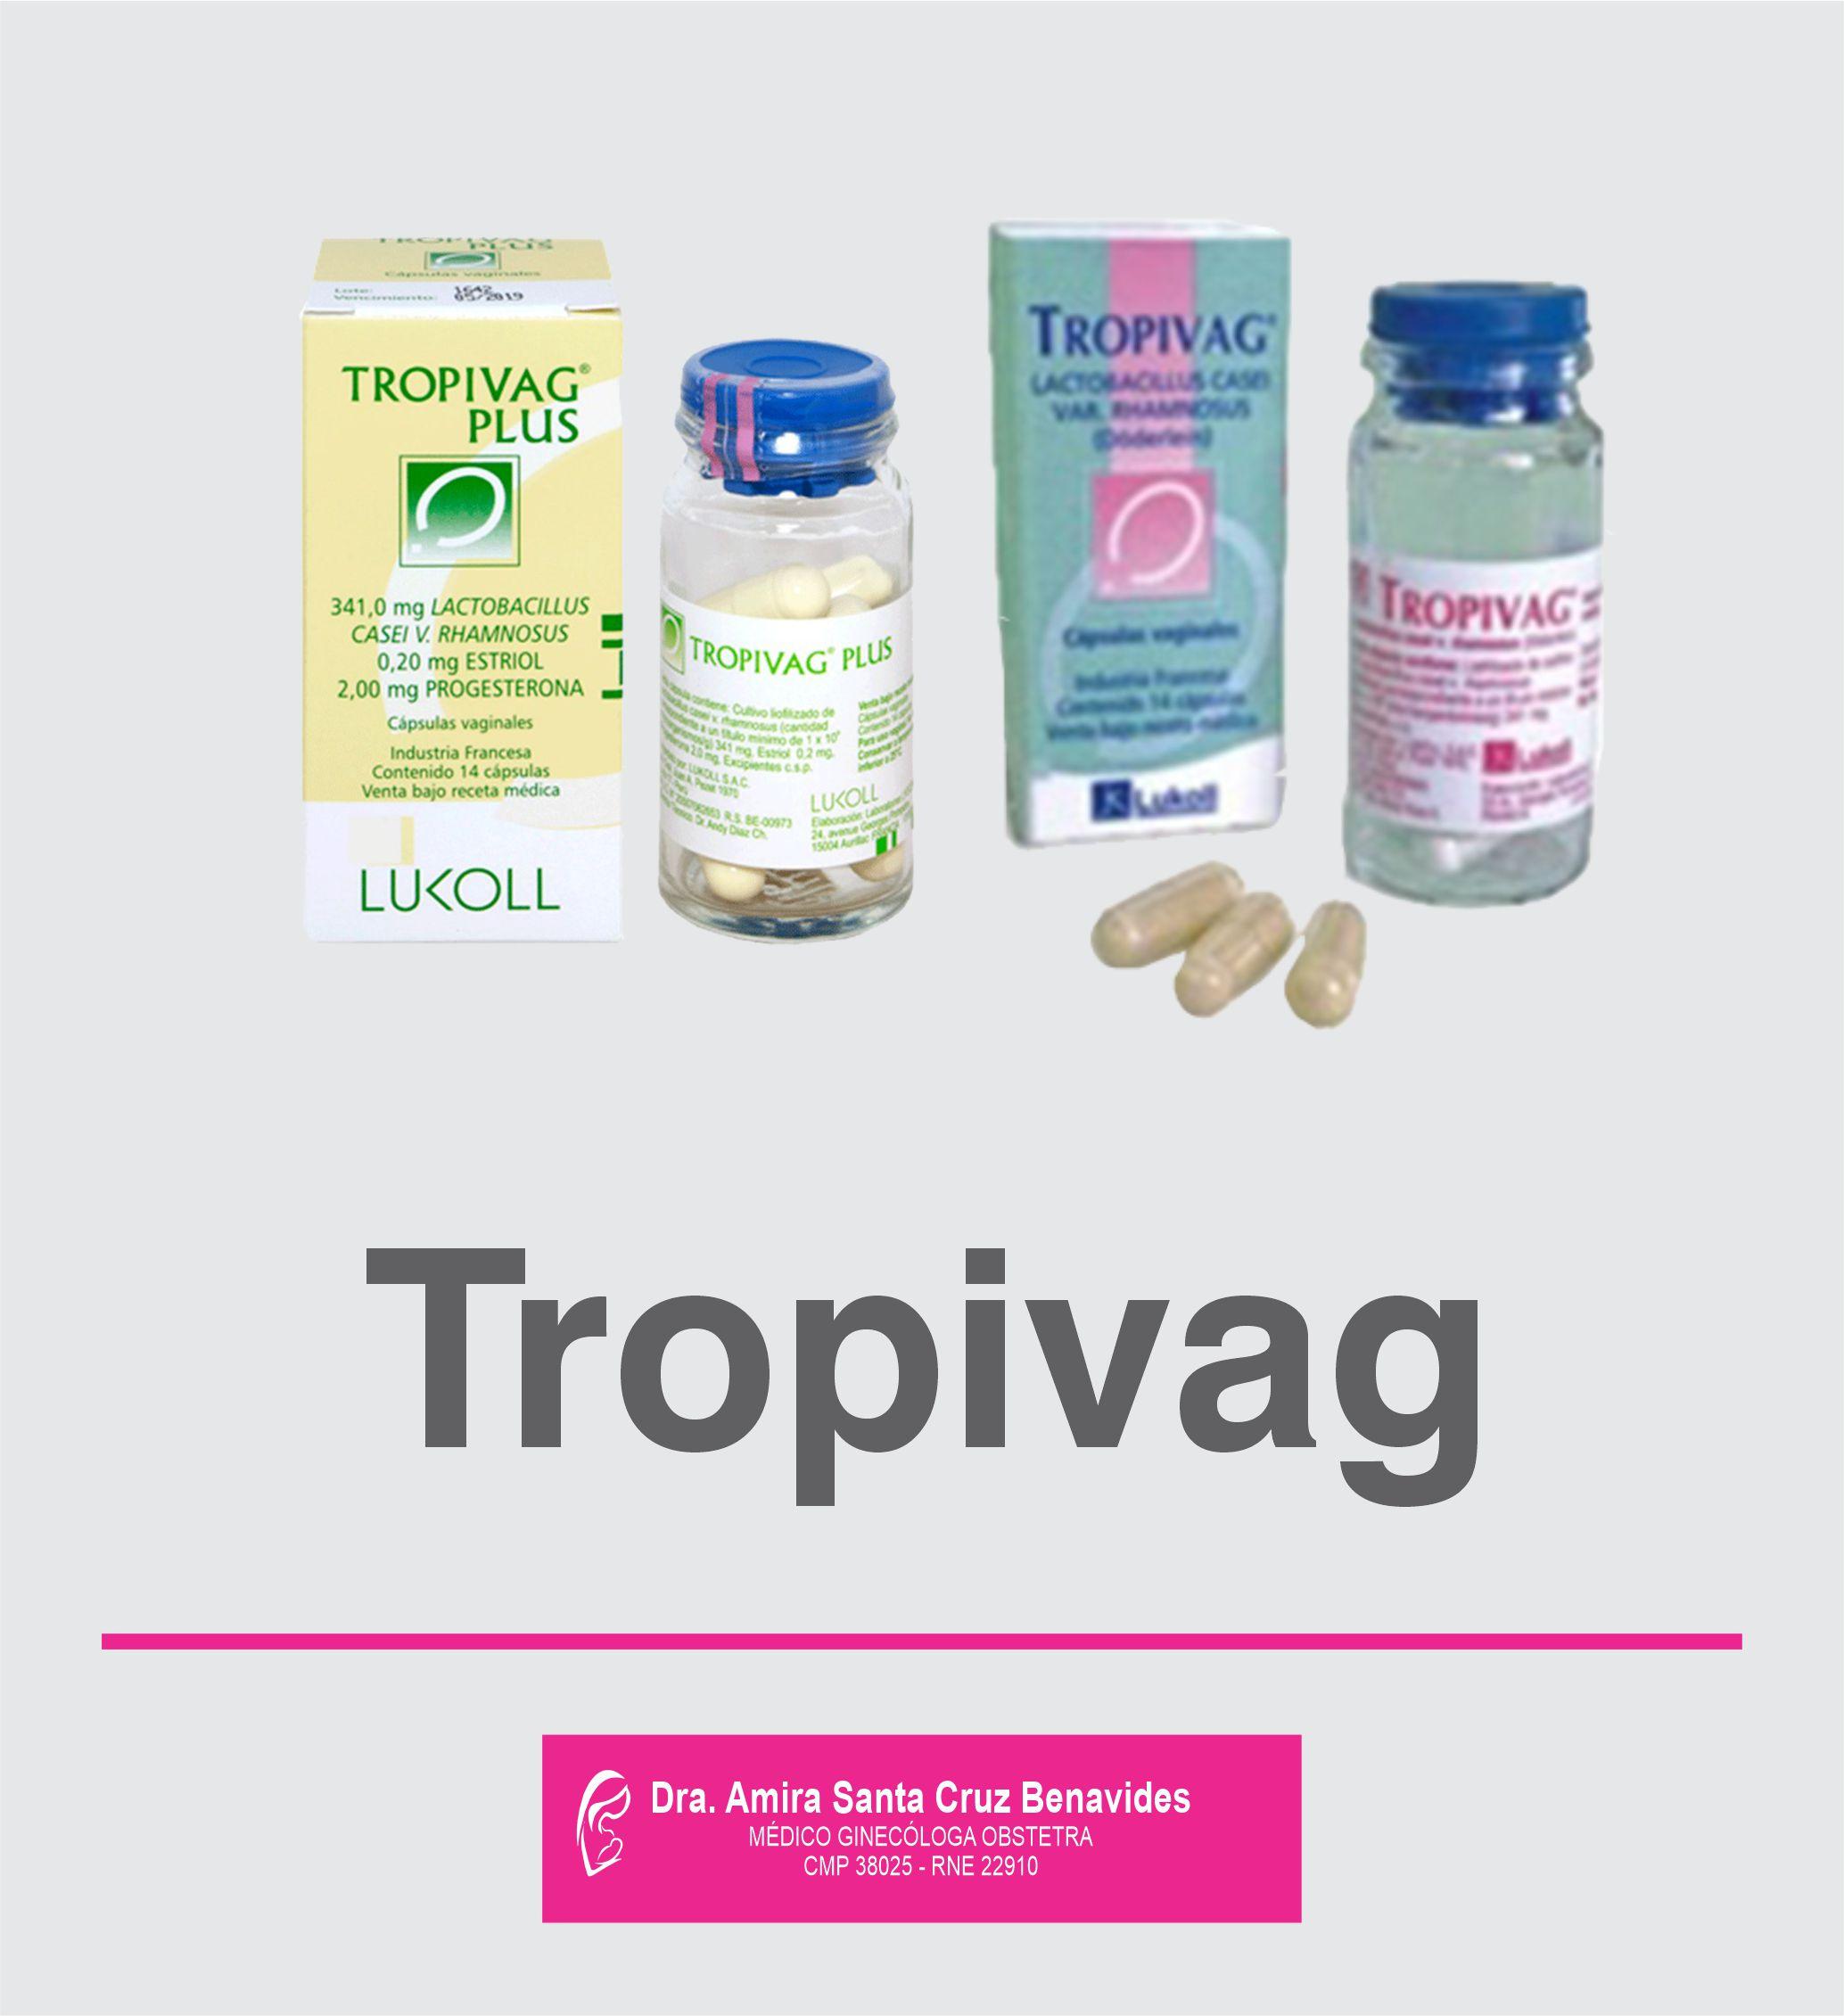 Amira Ginecologa Obstetra - Tropivag